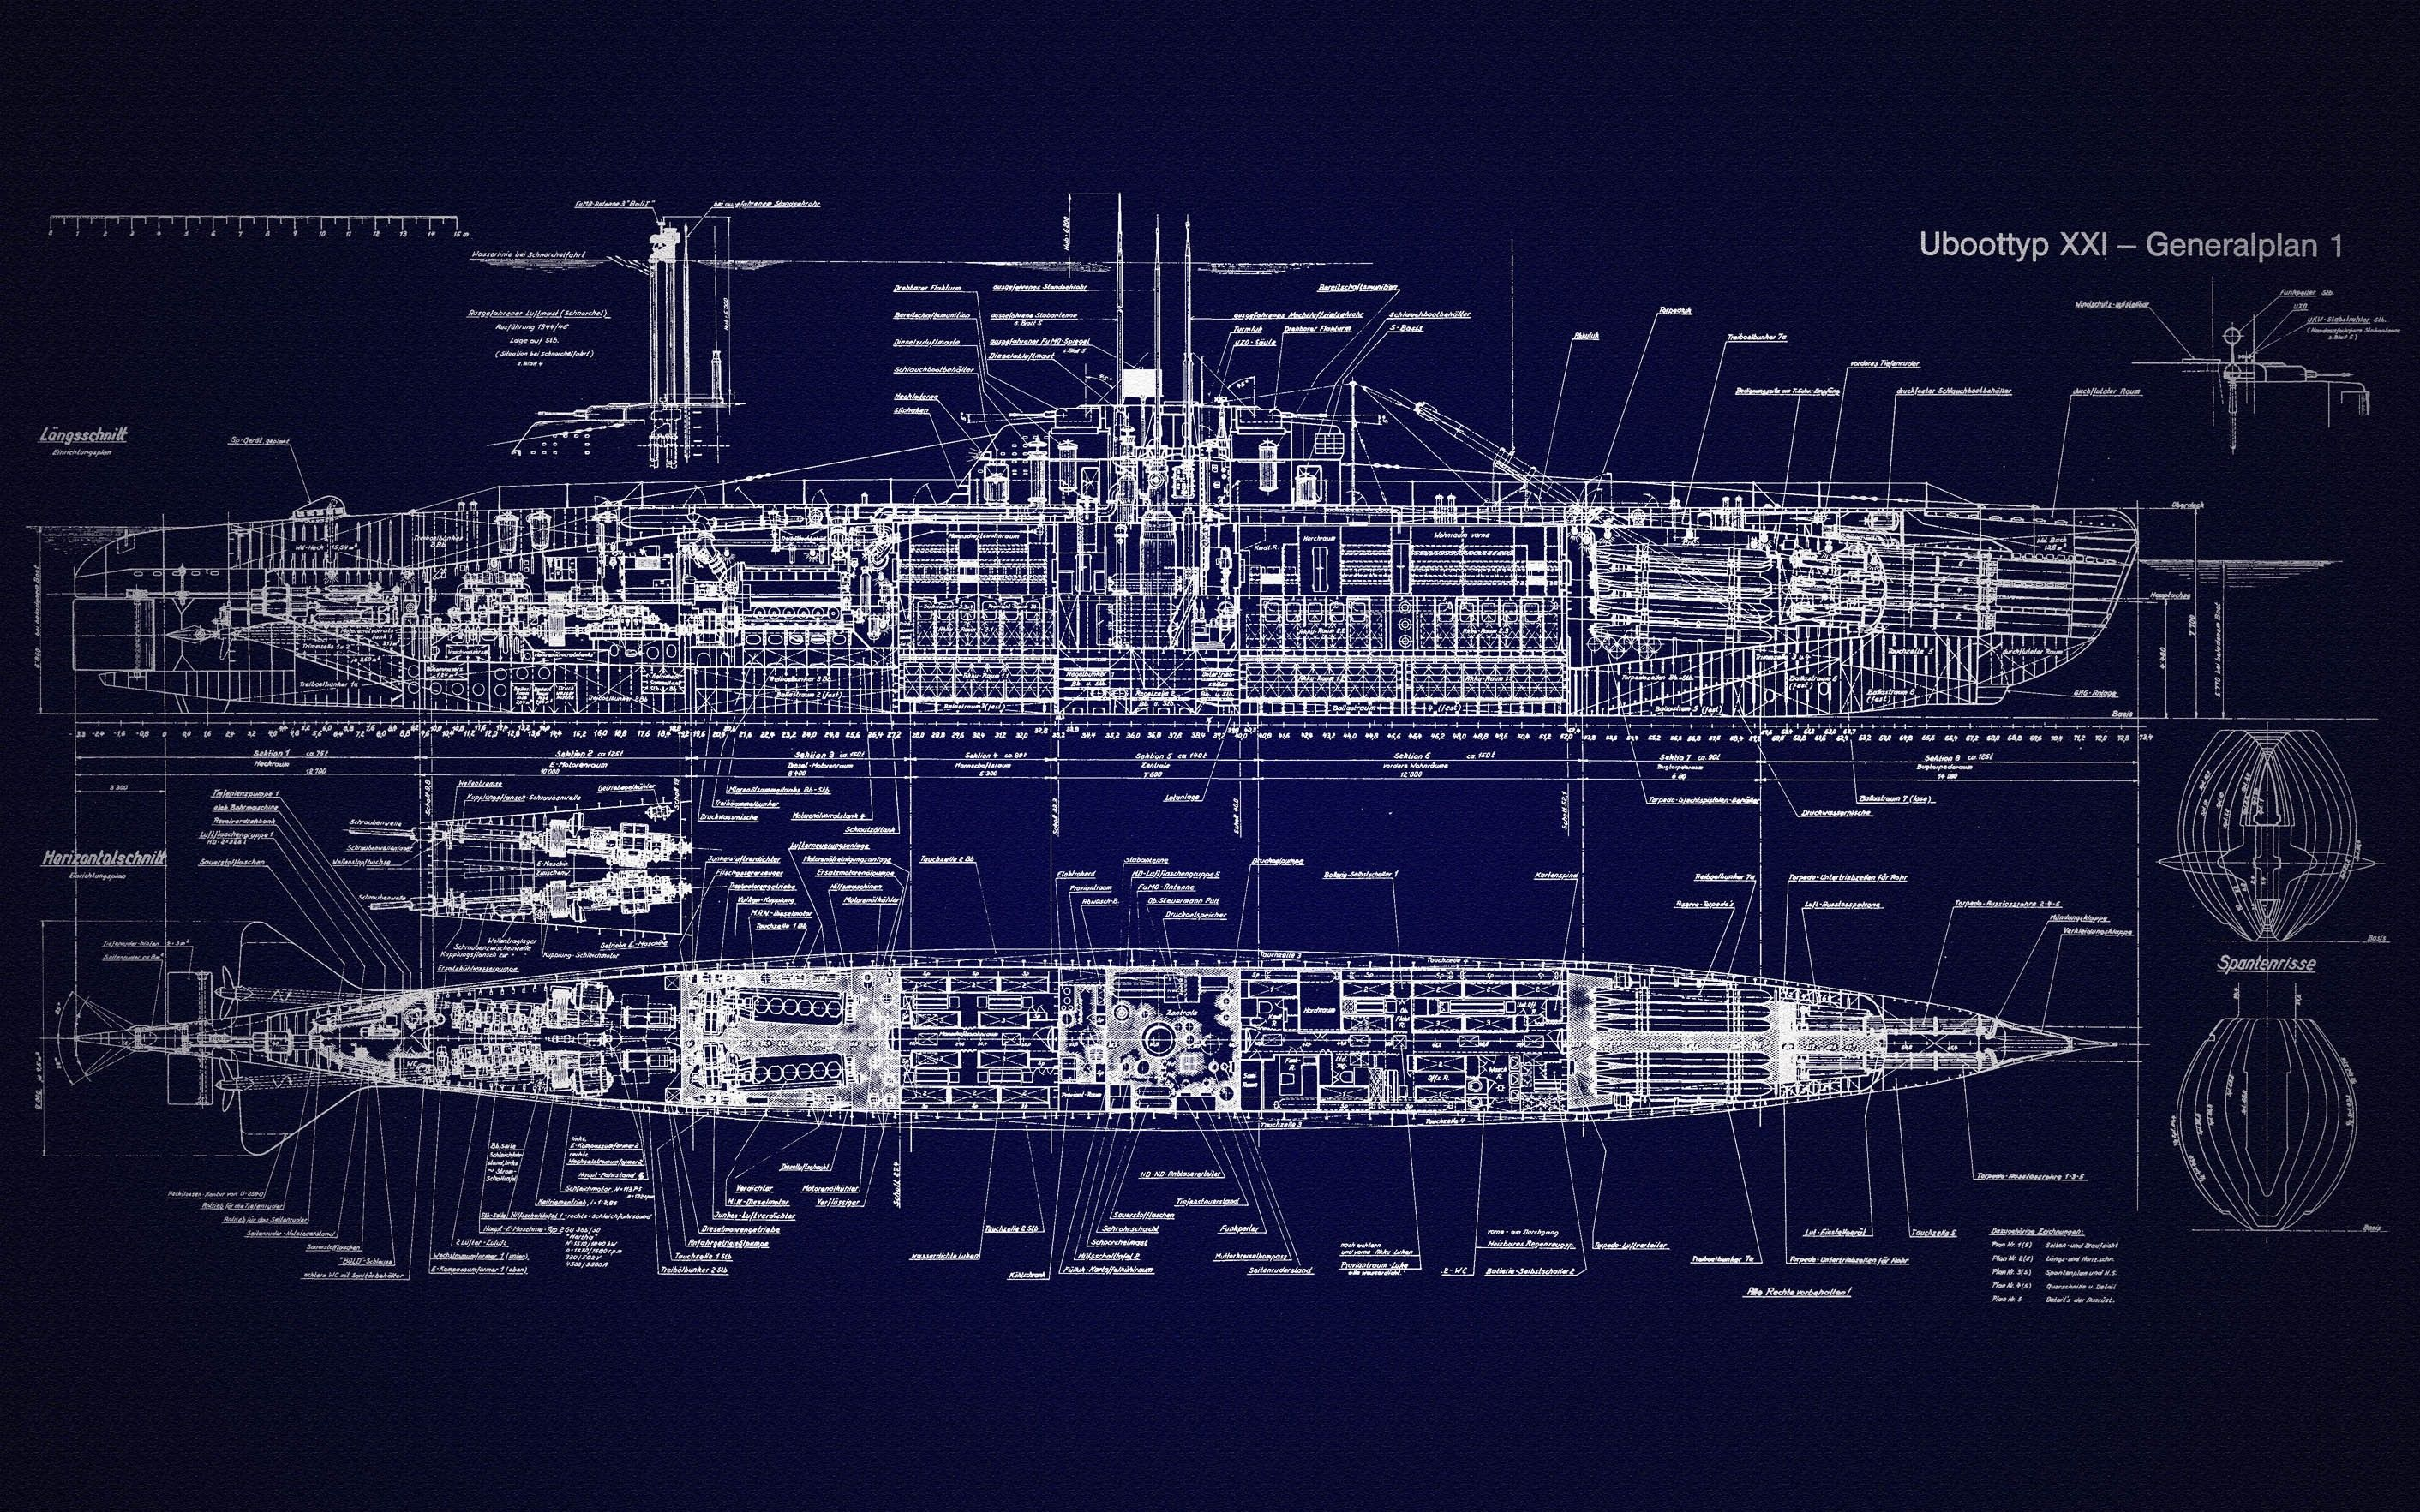 blueprints, #submarine, #u-boat, #type xxi, #schematic